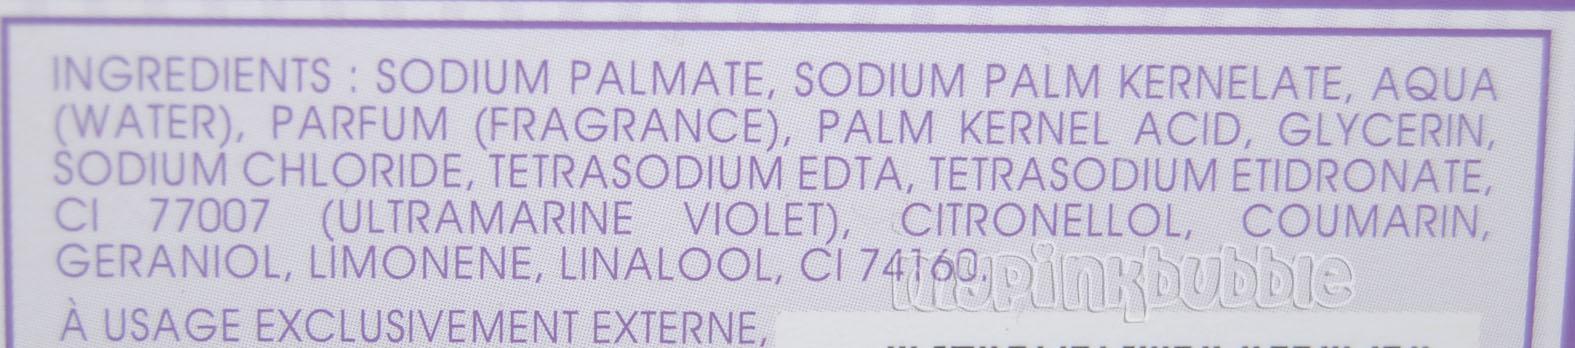 Jeanne provence jabon lavanda ingredientes